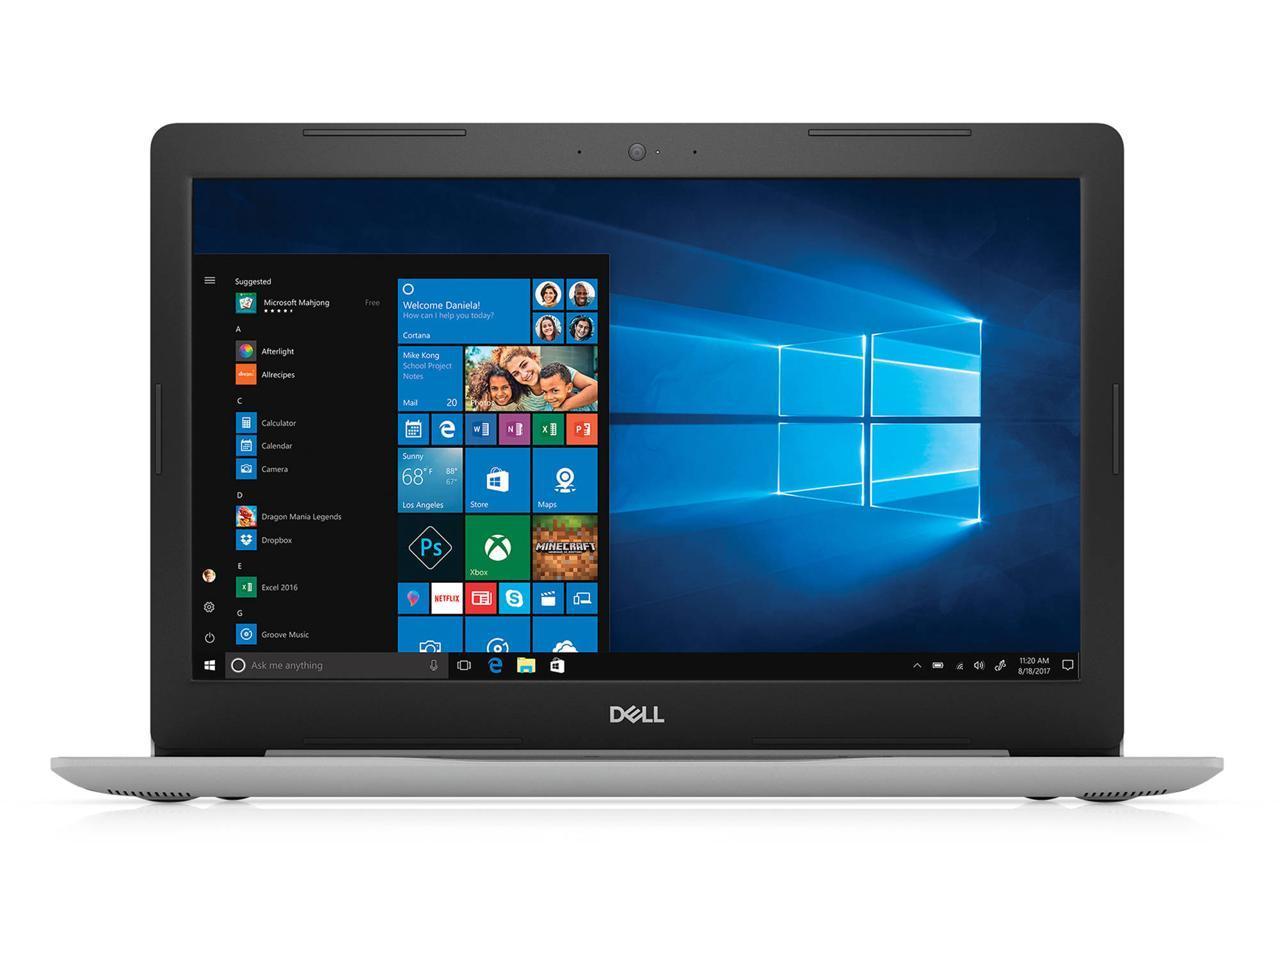 Dell Inspiron 15 5570: 15.6'' FHD, i7-8550U, 8GB DDR4, 128GB SSD + 1TB HDD, Fingerprint Reader, Win10H